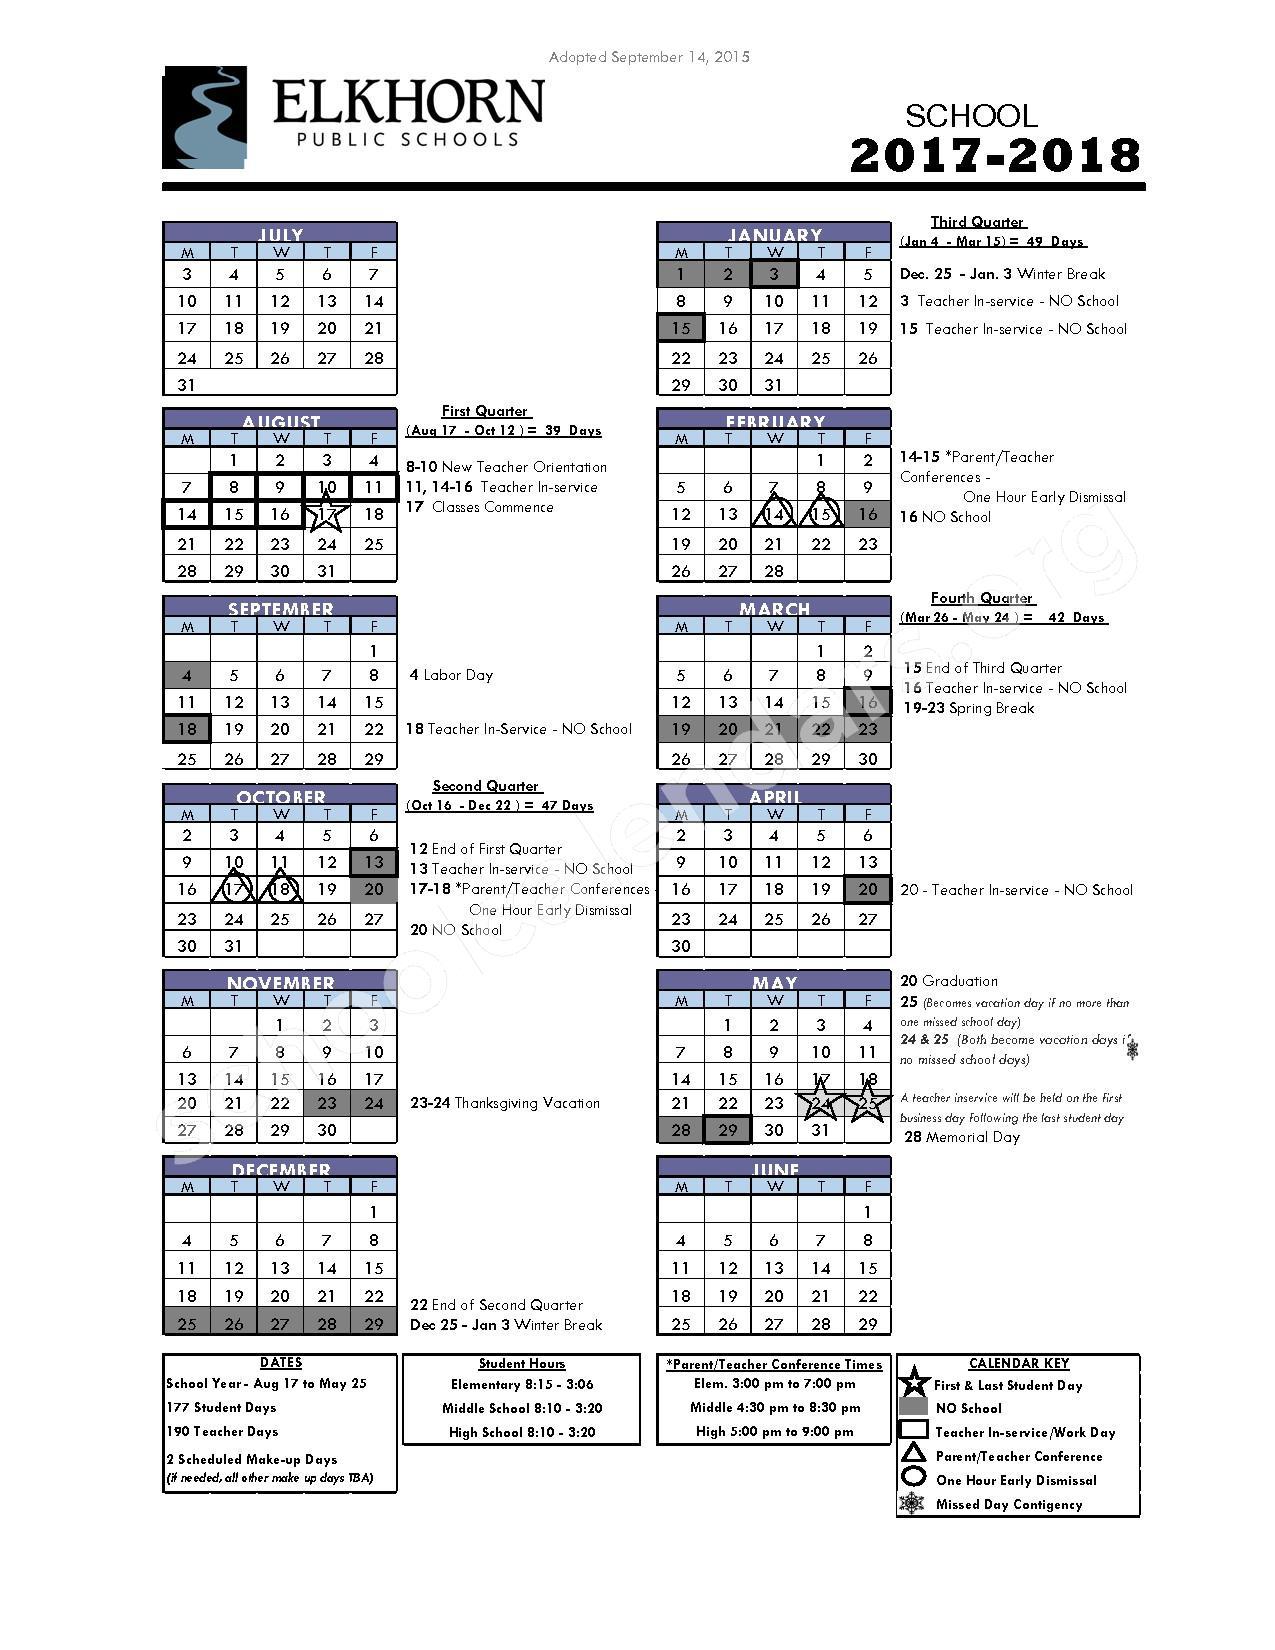 2017 - 2018 District Calendar – Elkhorn Public Schools – page 1